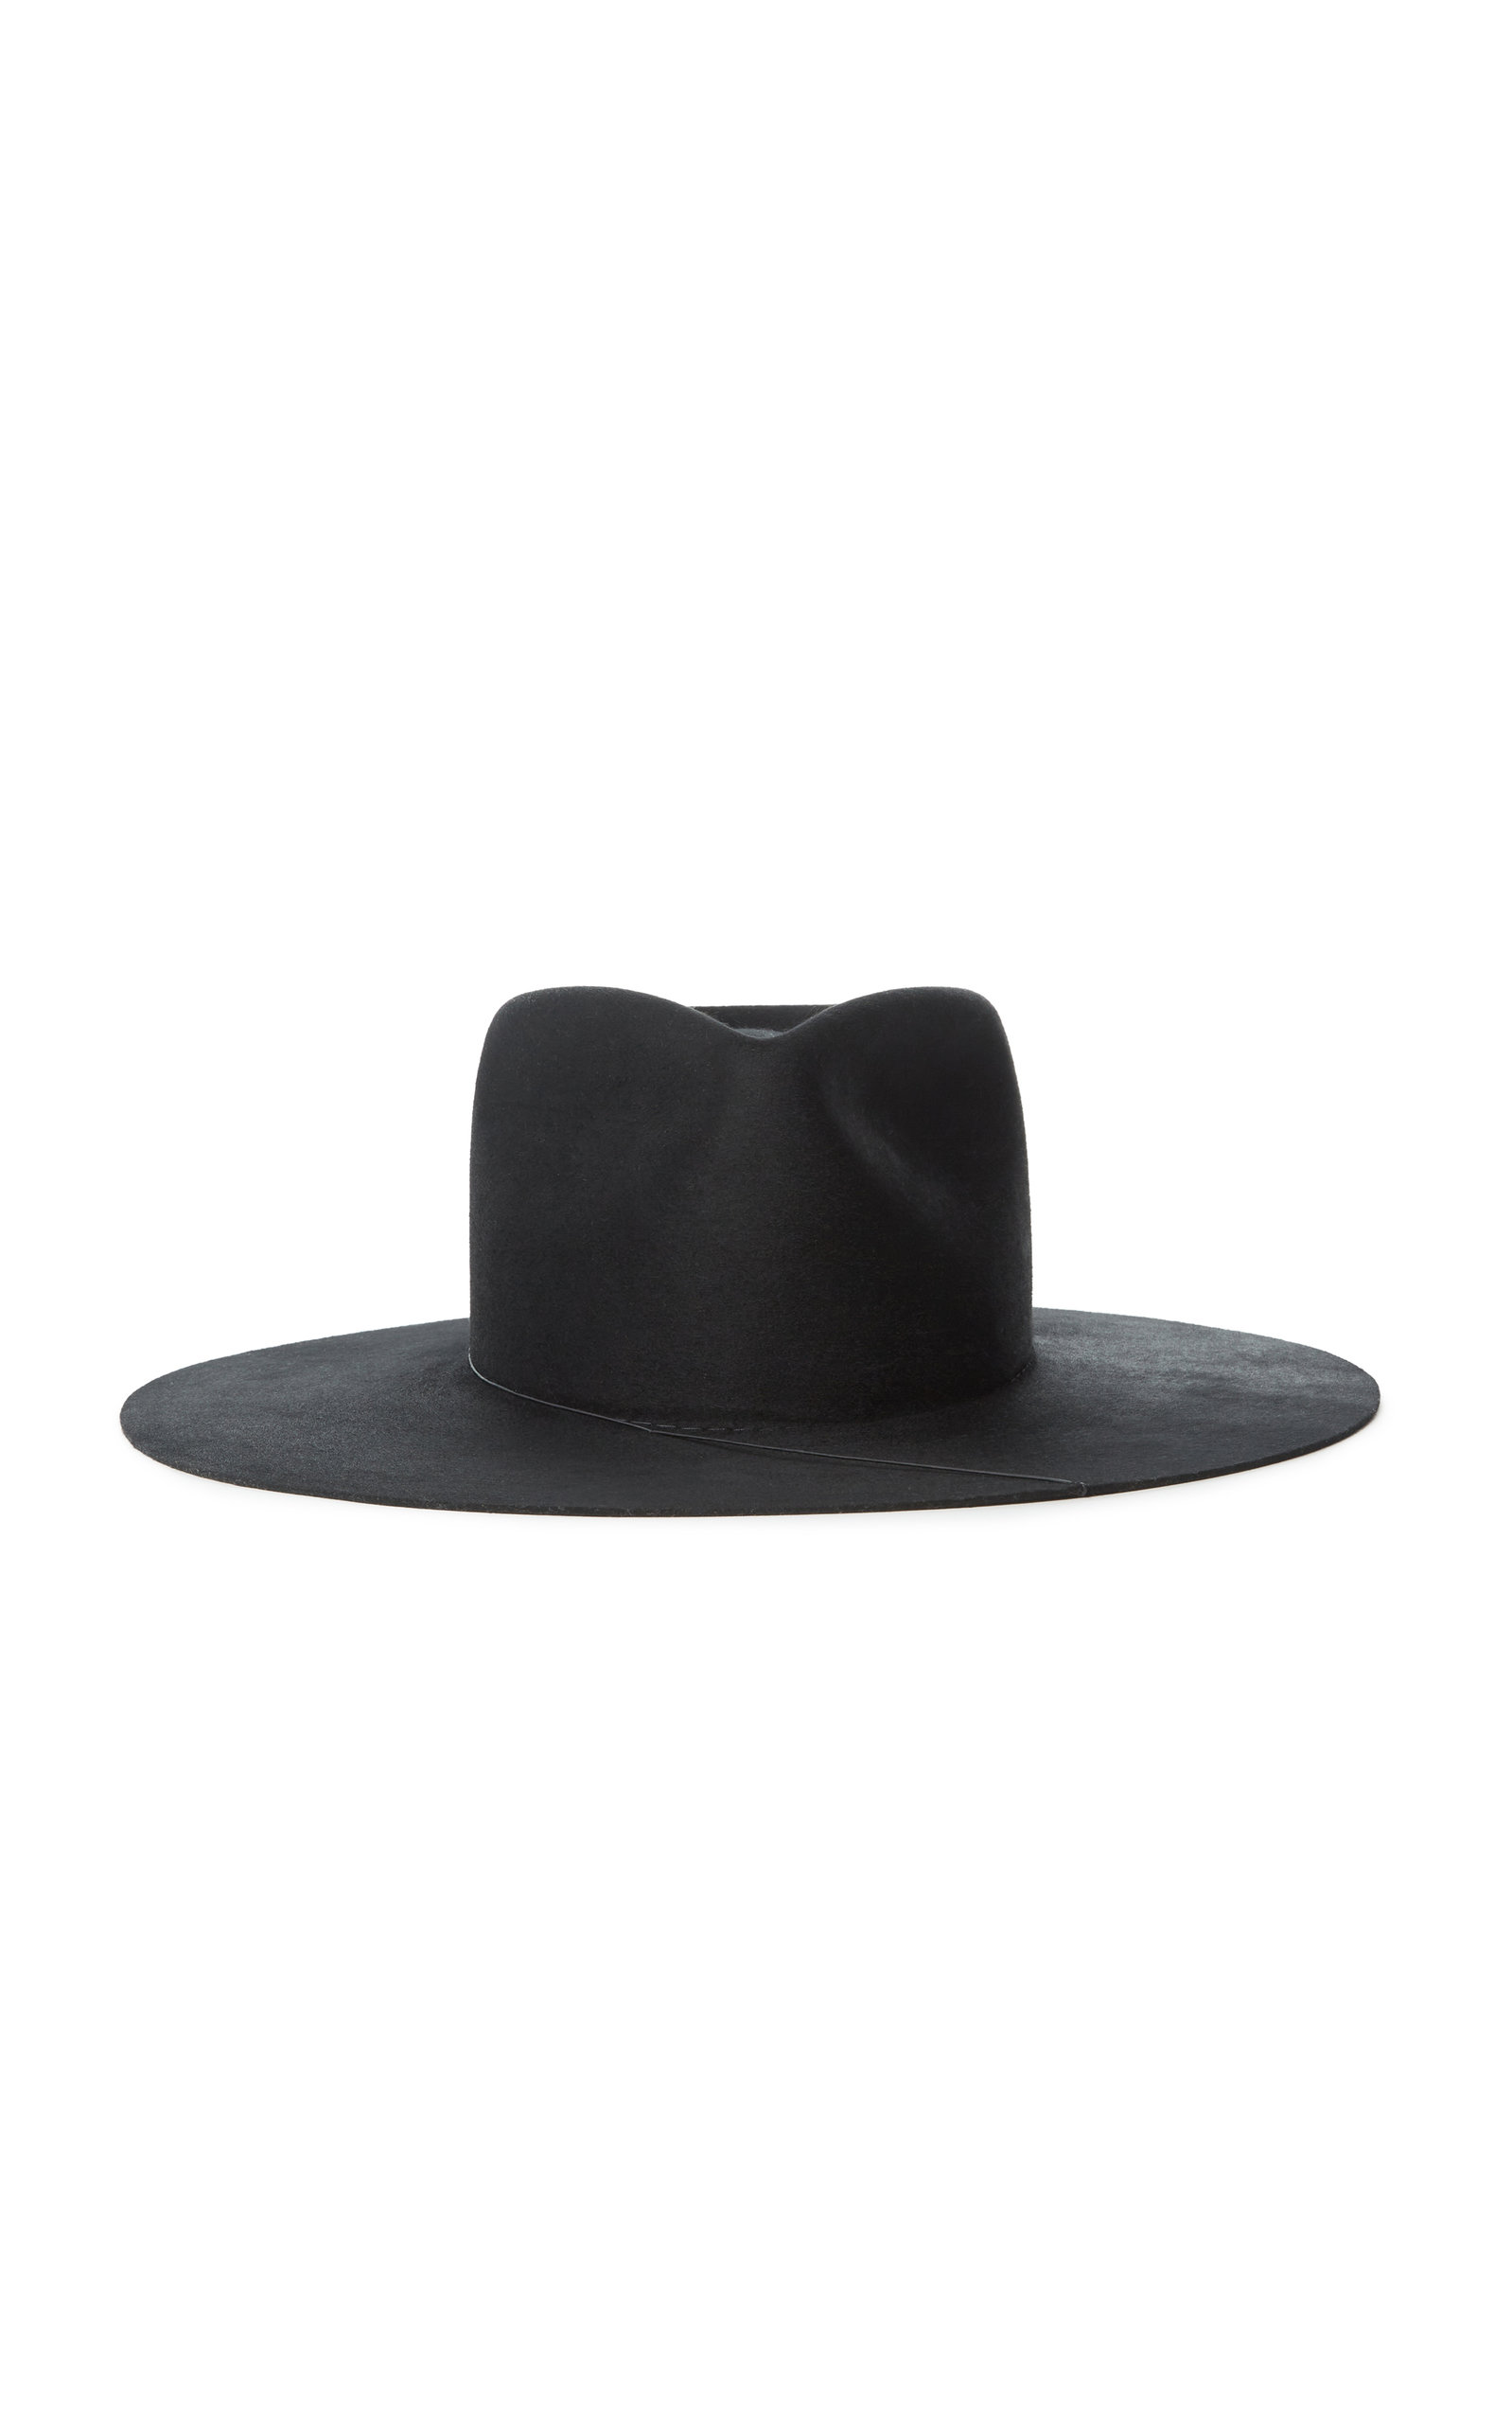 Janessa Leone RUBY WOOL WIDE-BRIM HAT